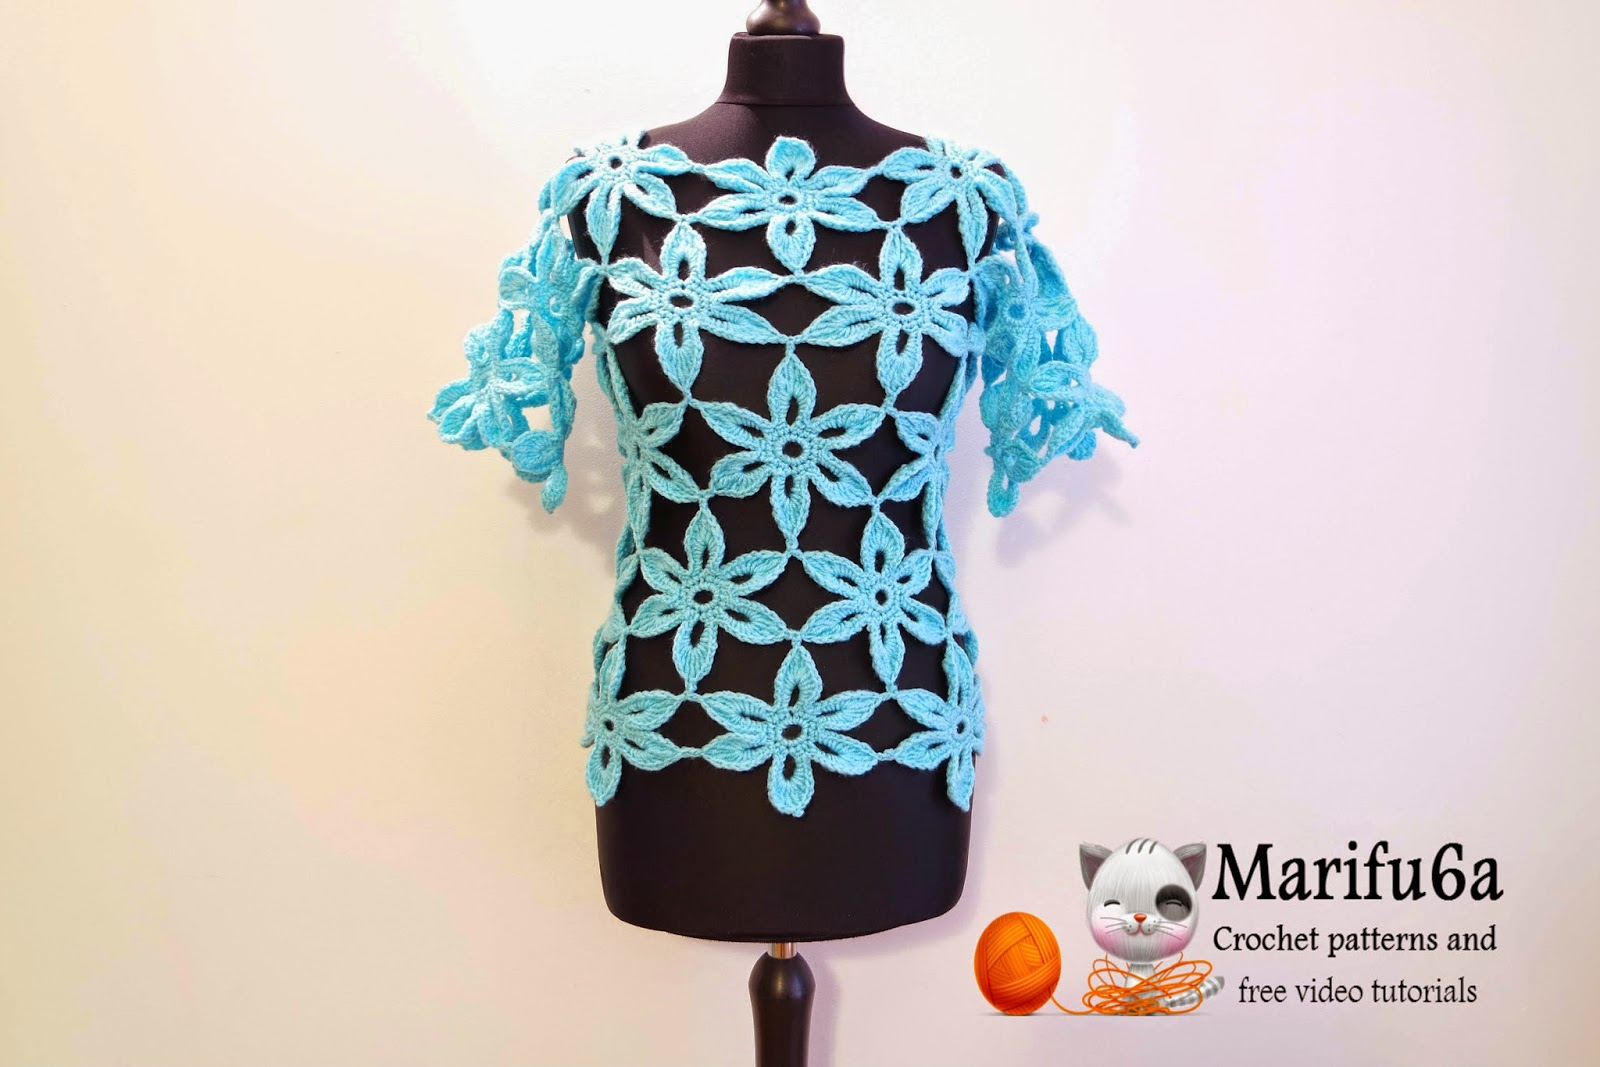 a8fffa5e8 Free crochet patterns and video tutorials  How to crochet flower ...